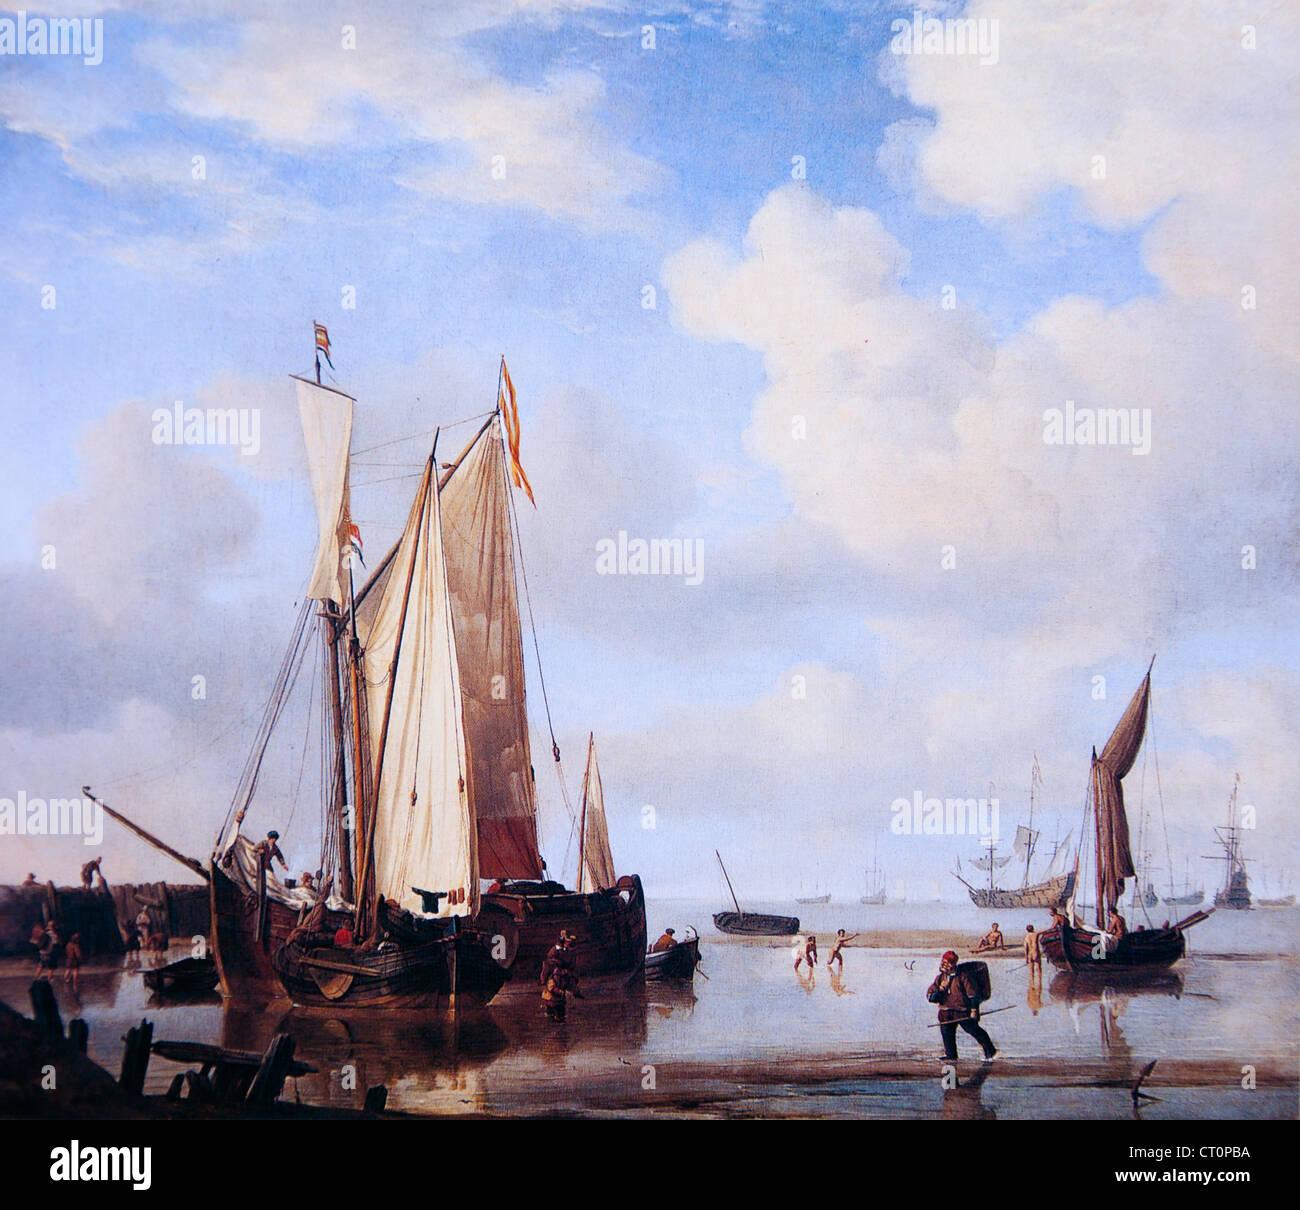 Willem van de Velde - Dutch Vessels at Low Tide - Stock Image